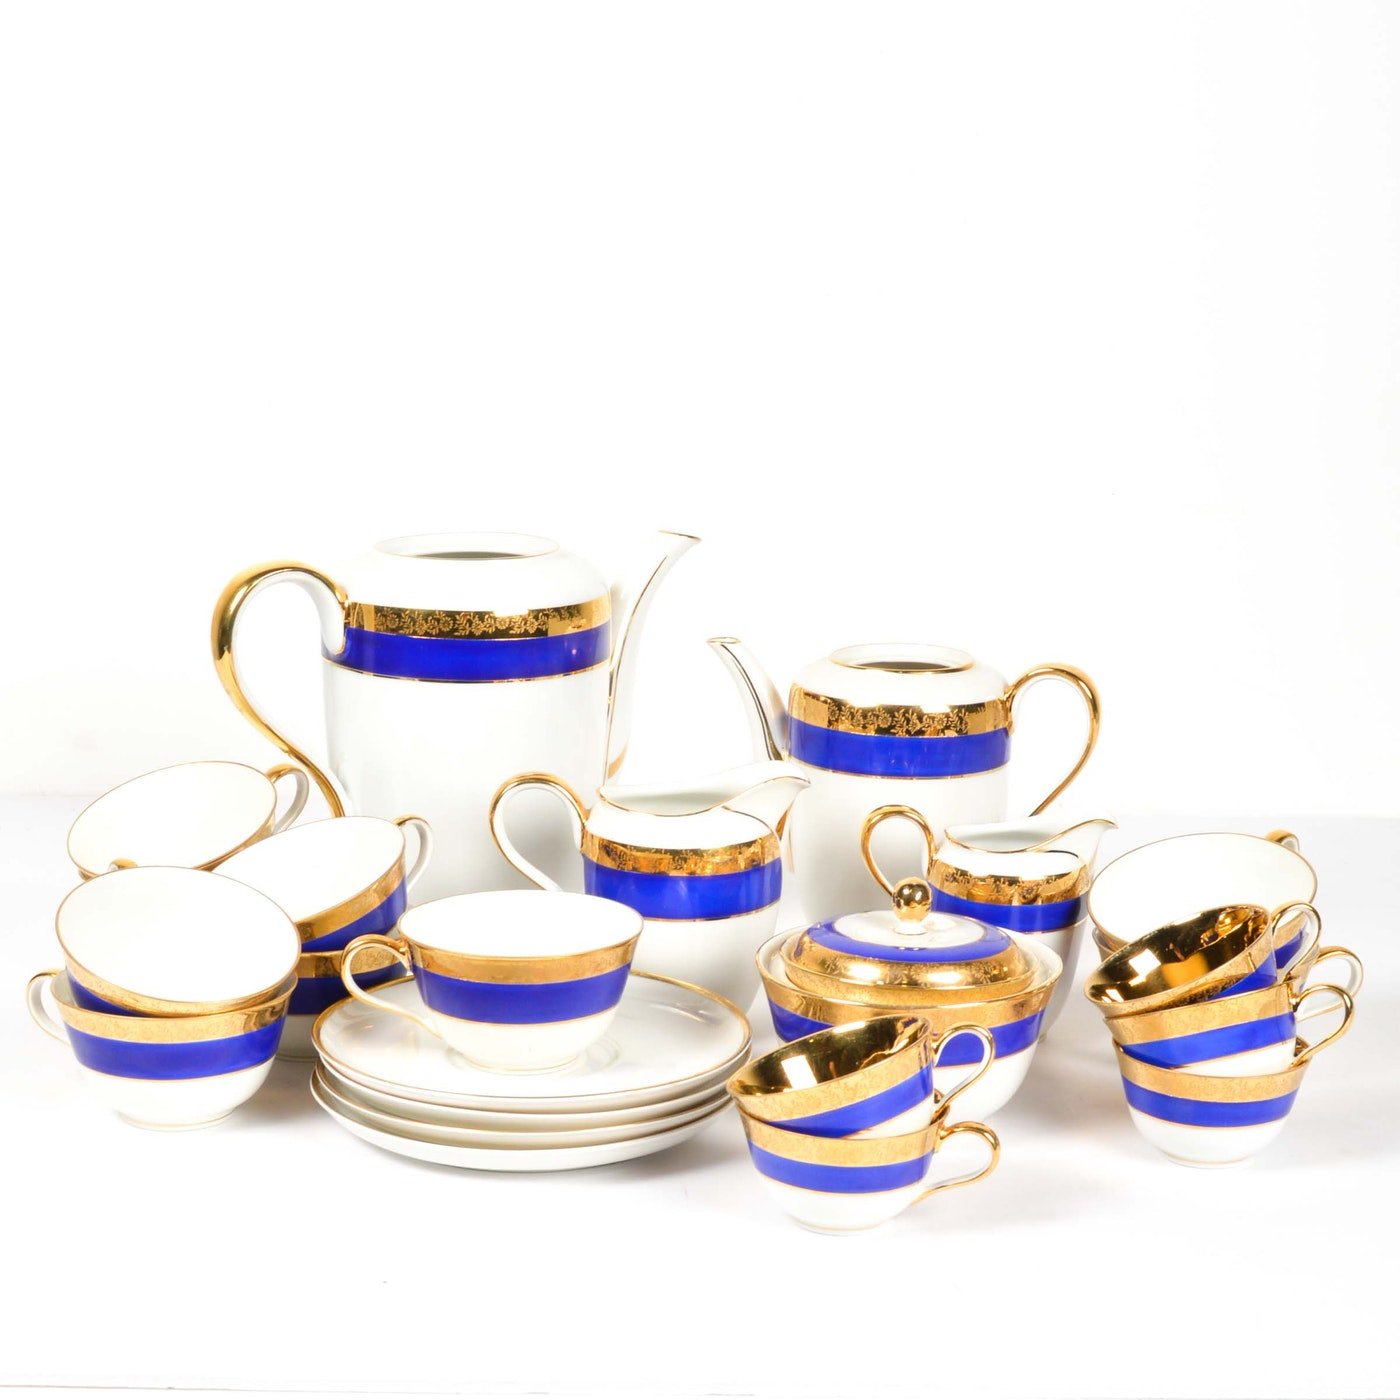 rosenthal helena china tea service ebth. Black Bedroom Furniture Sets. Home Design Ideas